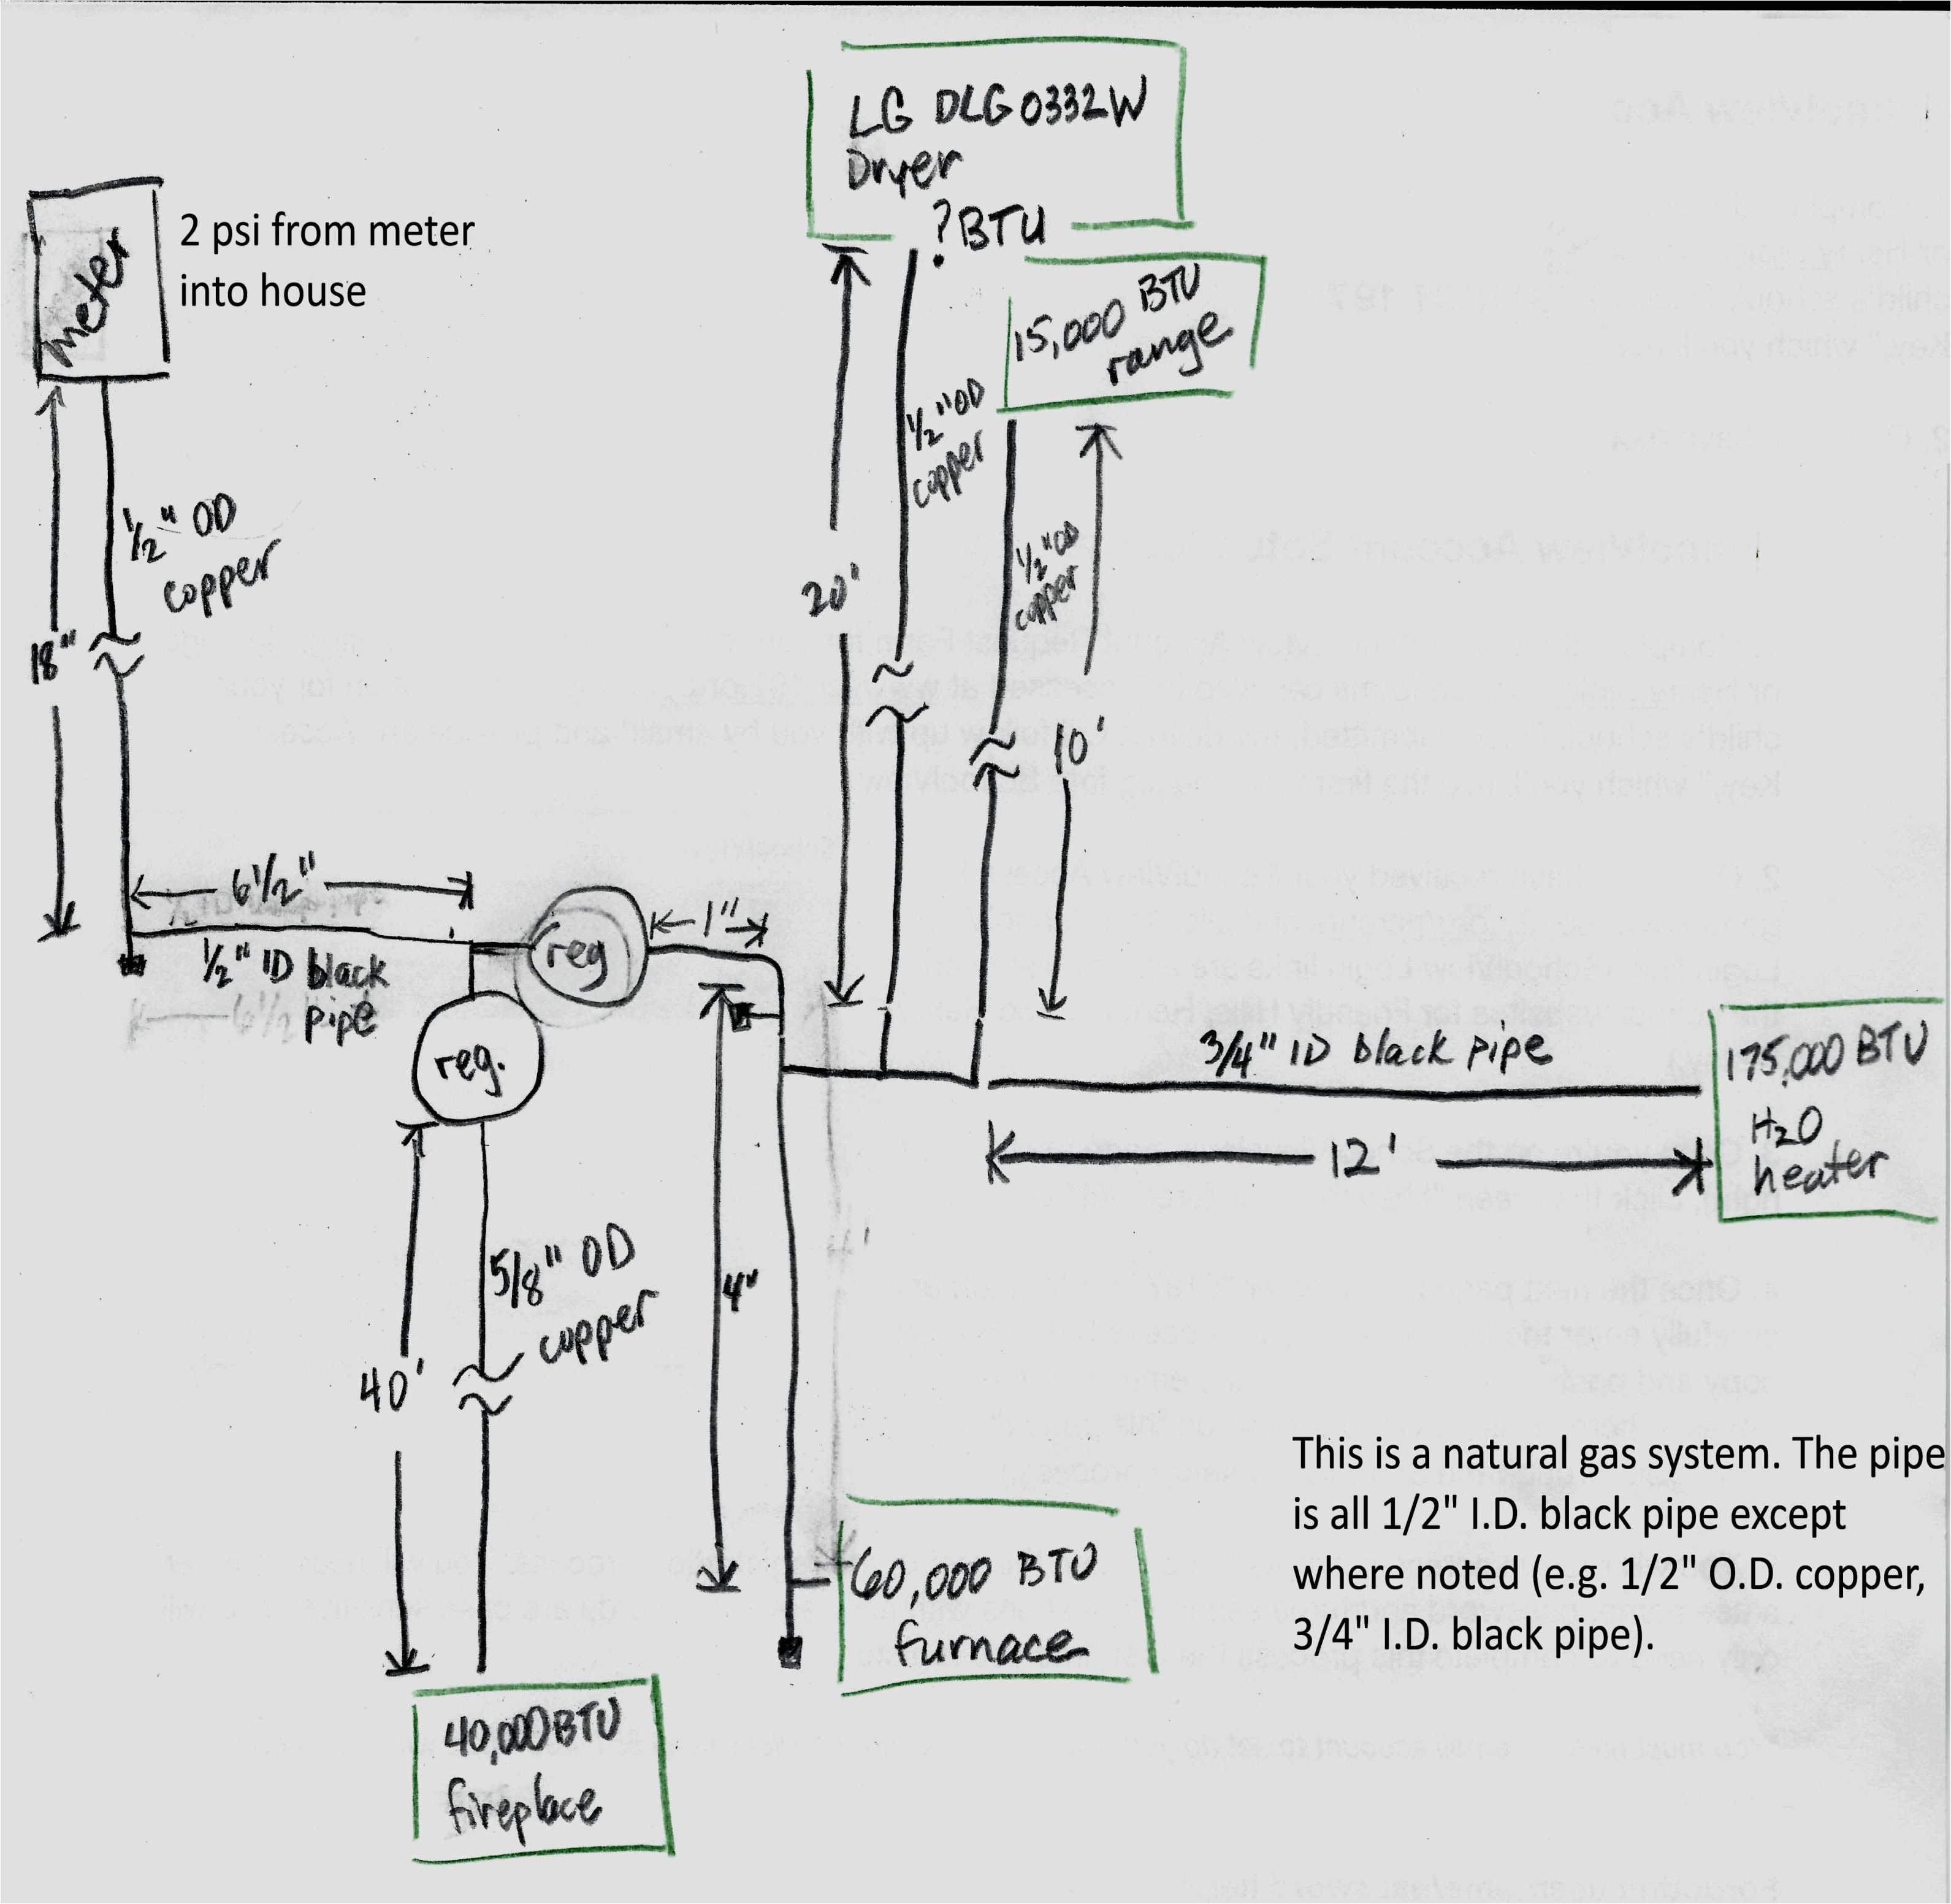 1975 corvette wiring diagram 1981 corvette dash wiring diagram custom wiring diagram u2022 rh littlewaves co